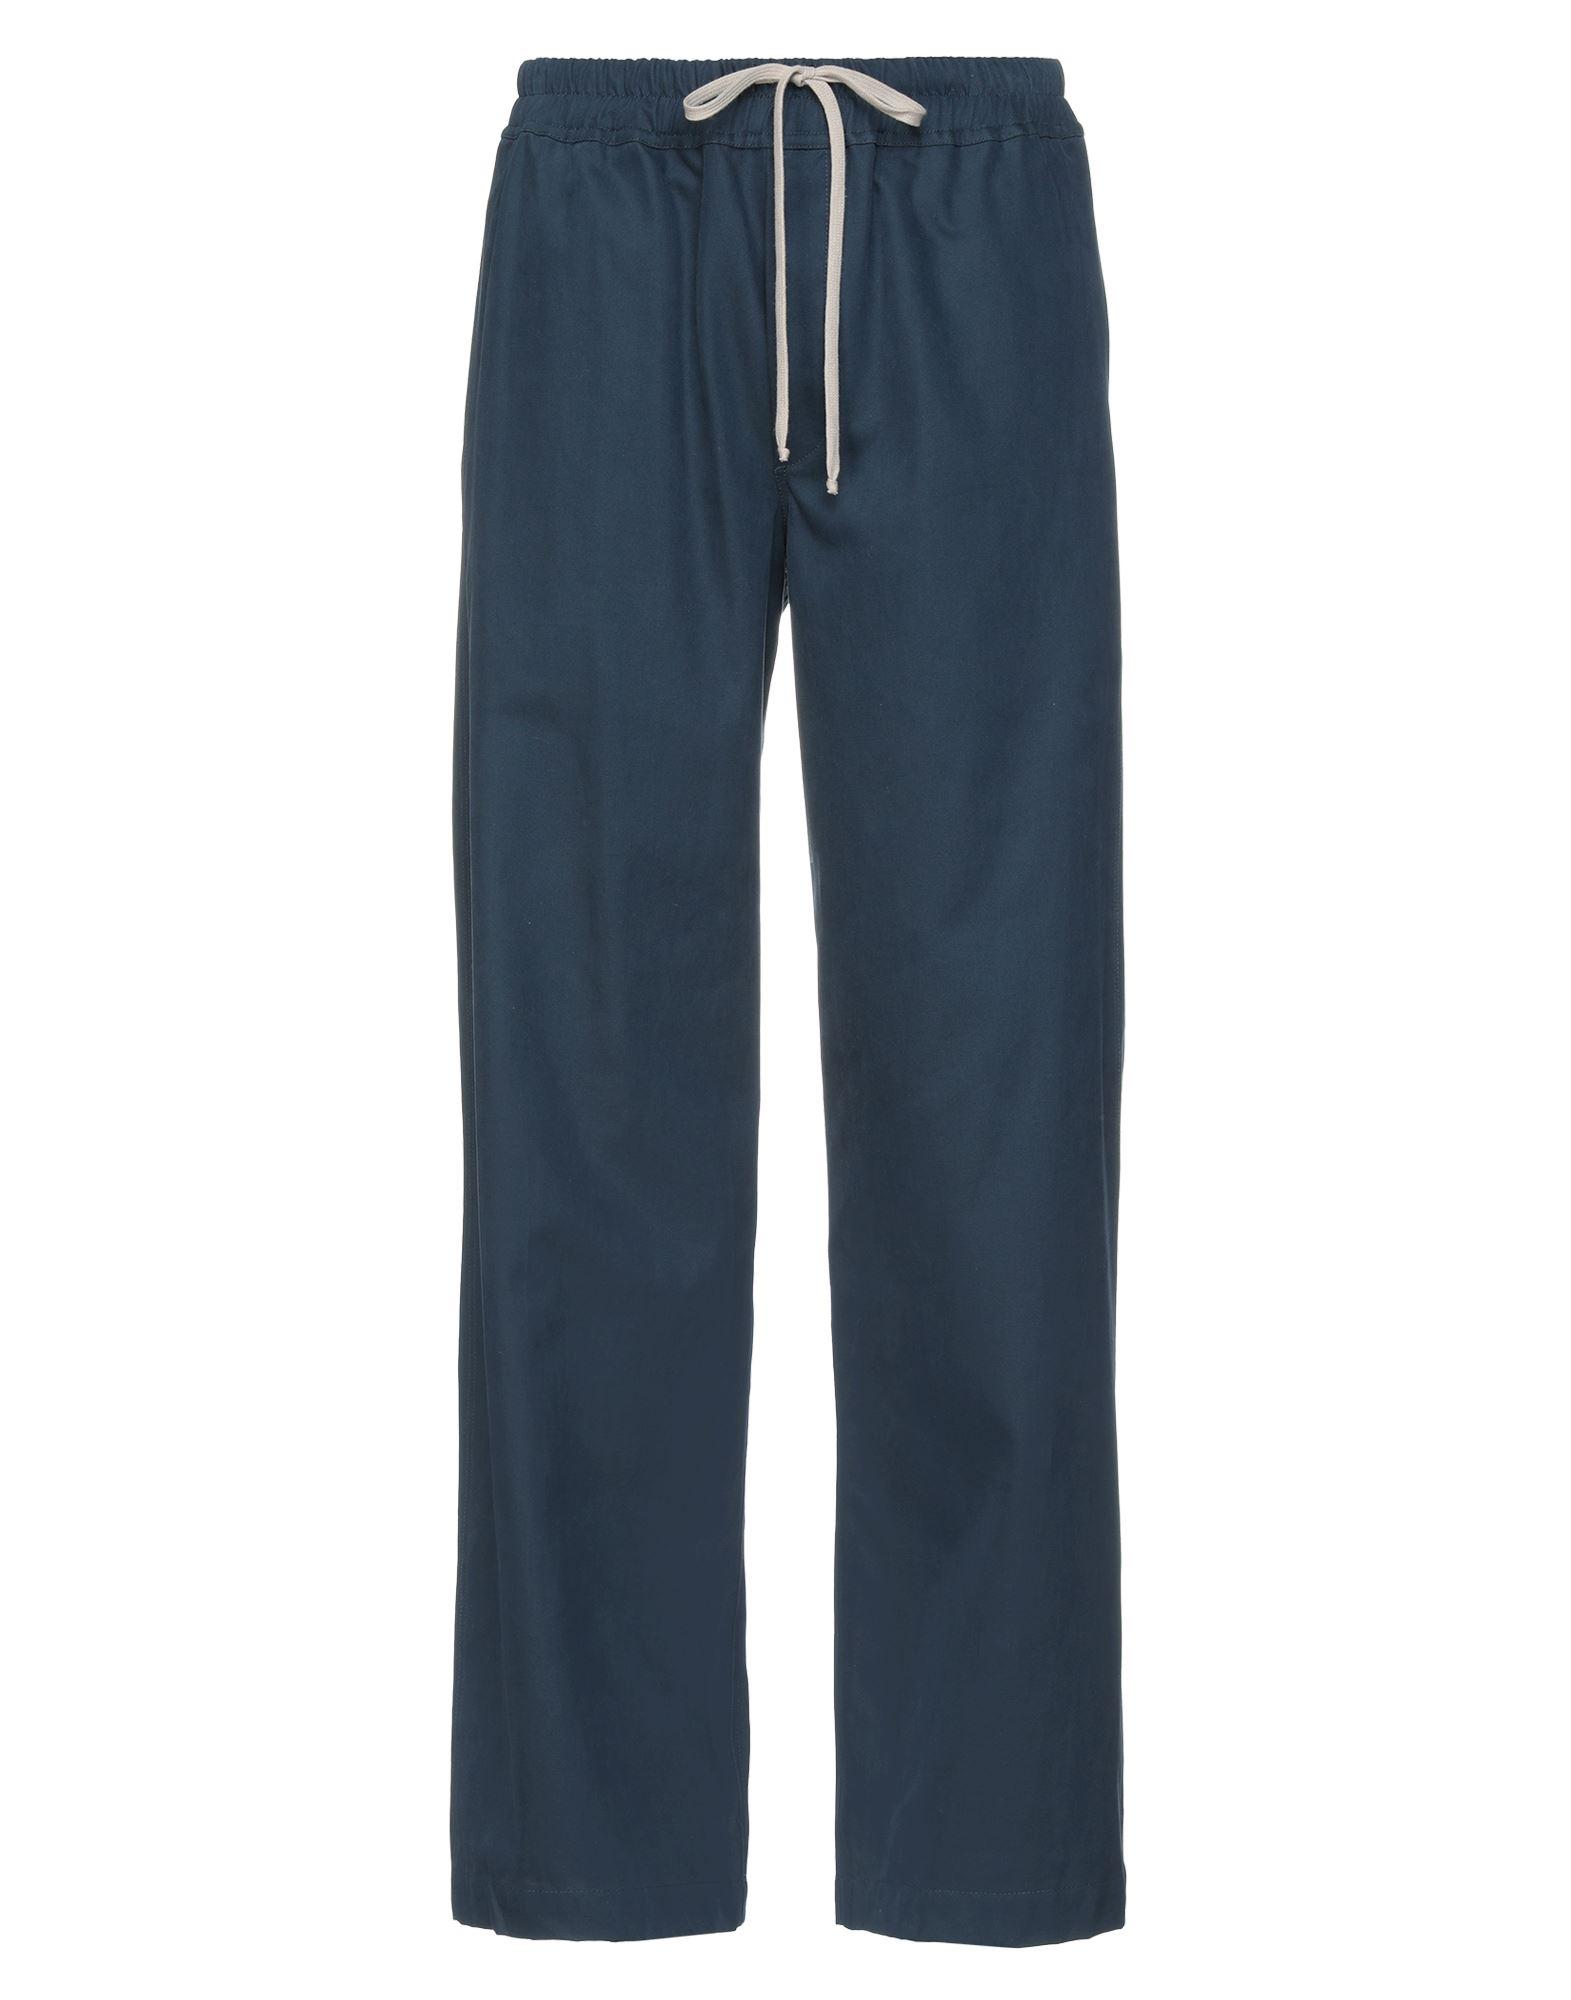 DRKSHDW by RICK OWENS Повседневные брюки drkshdw by rick owens джинсовые брюки капри